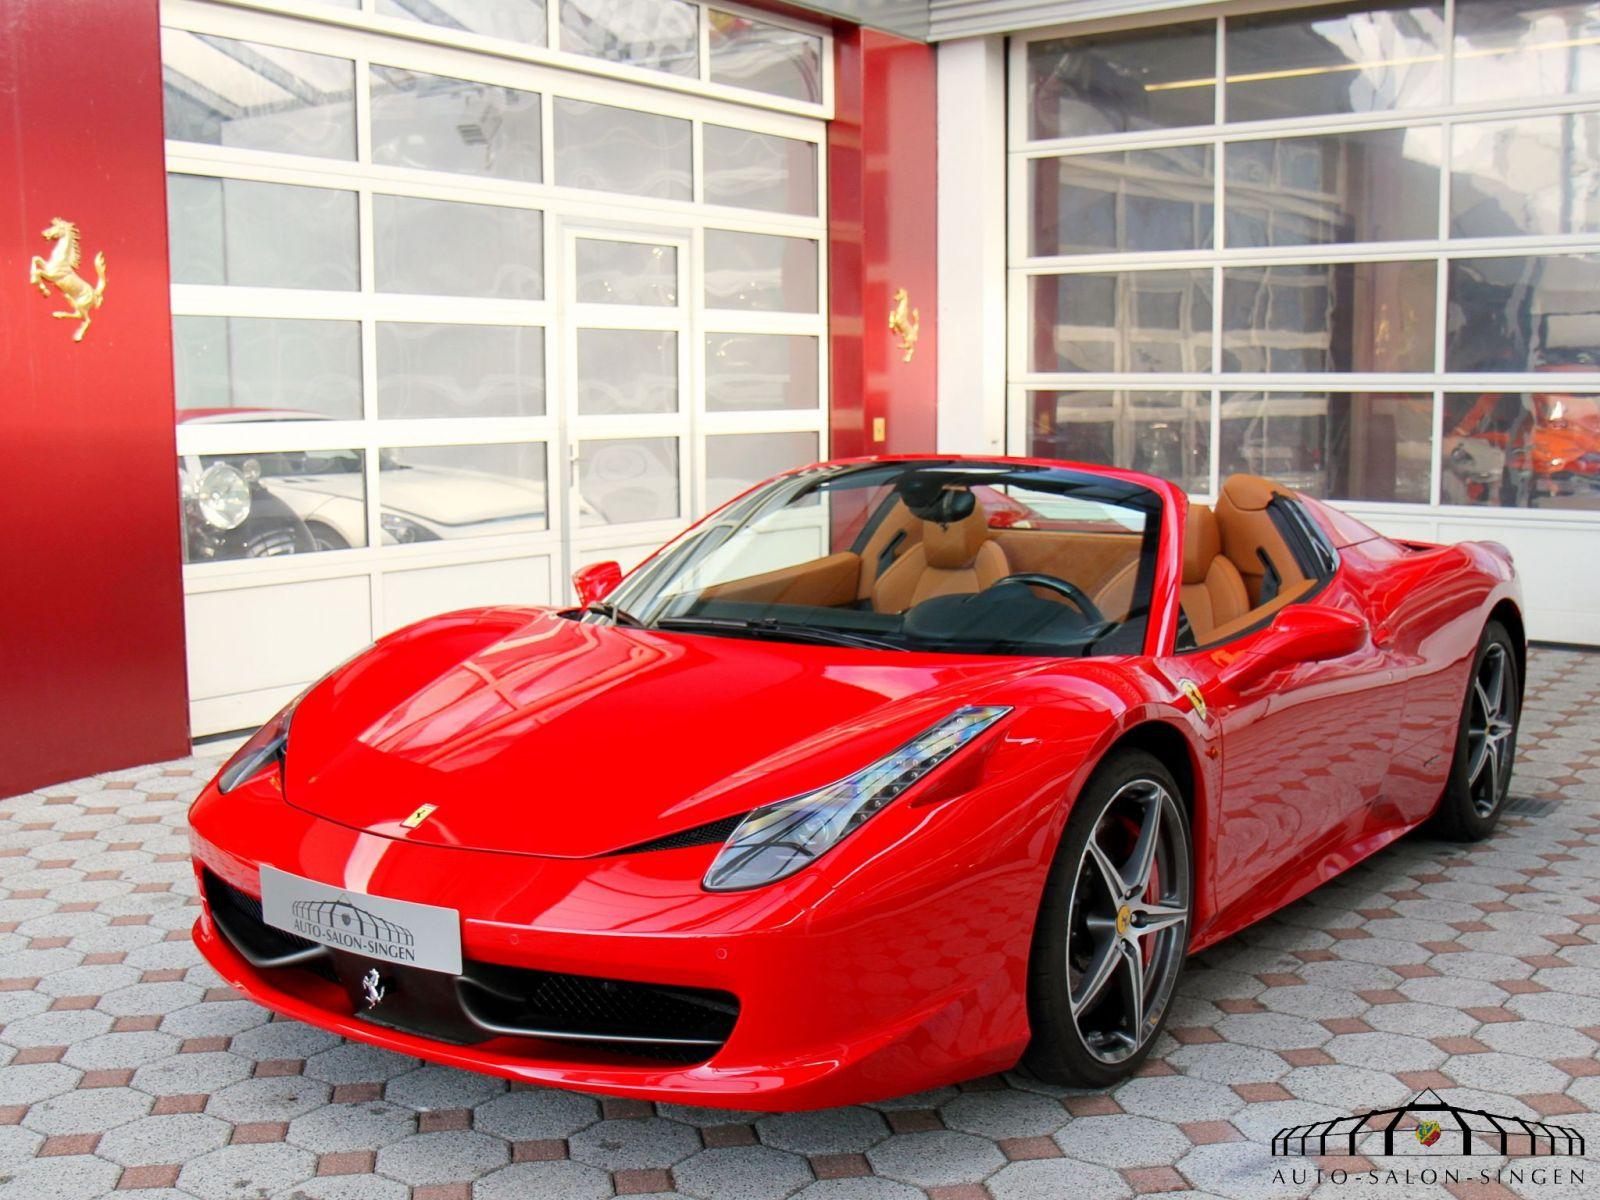 Ferrari 458 Spider Convertible Auto Salon Singen